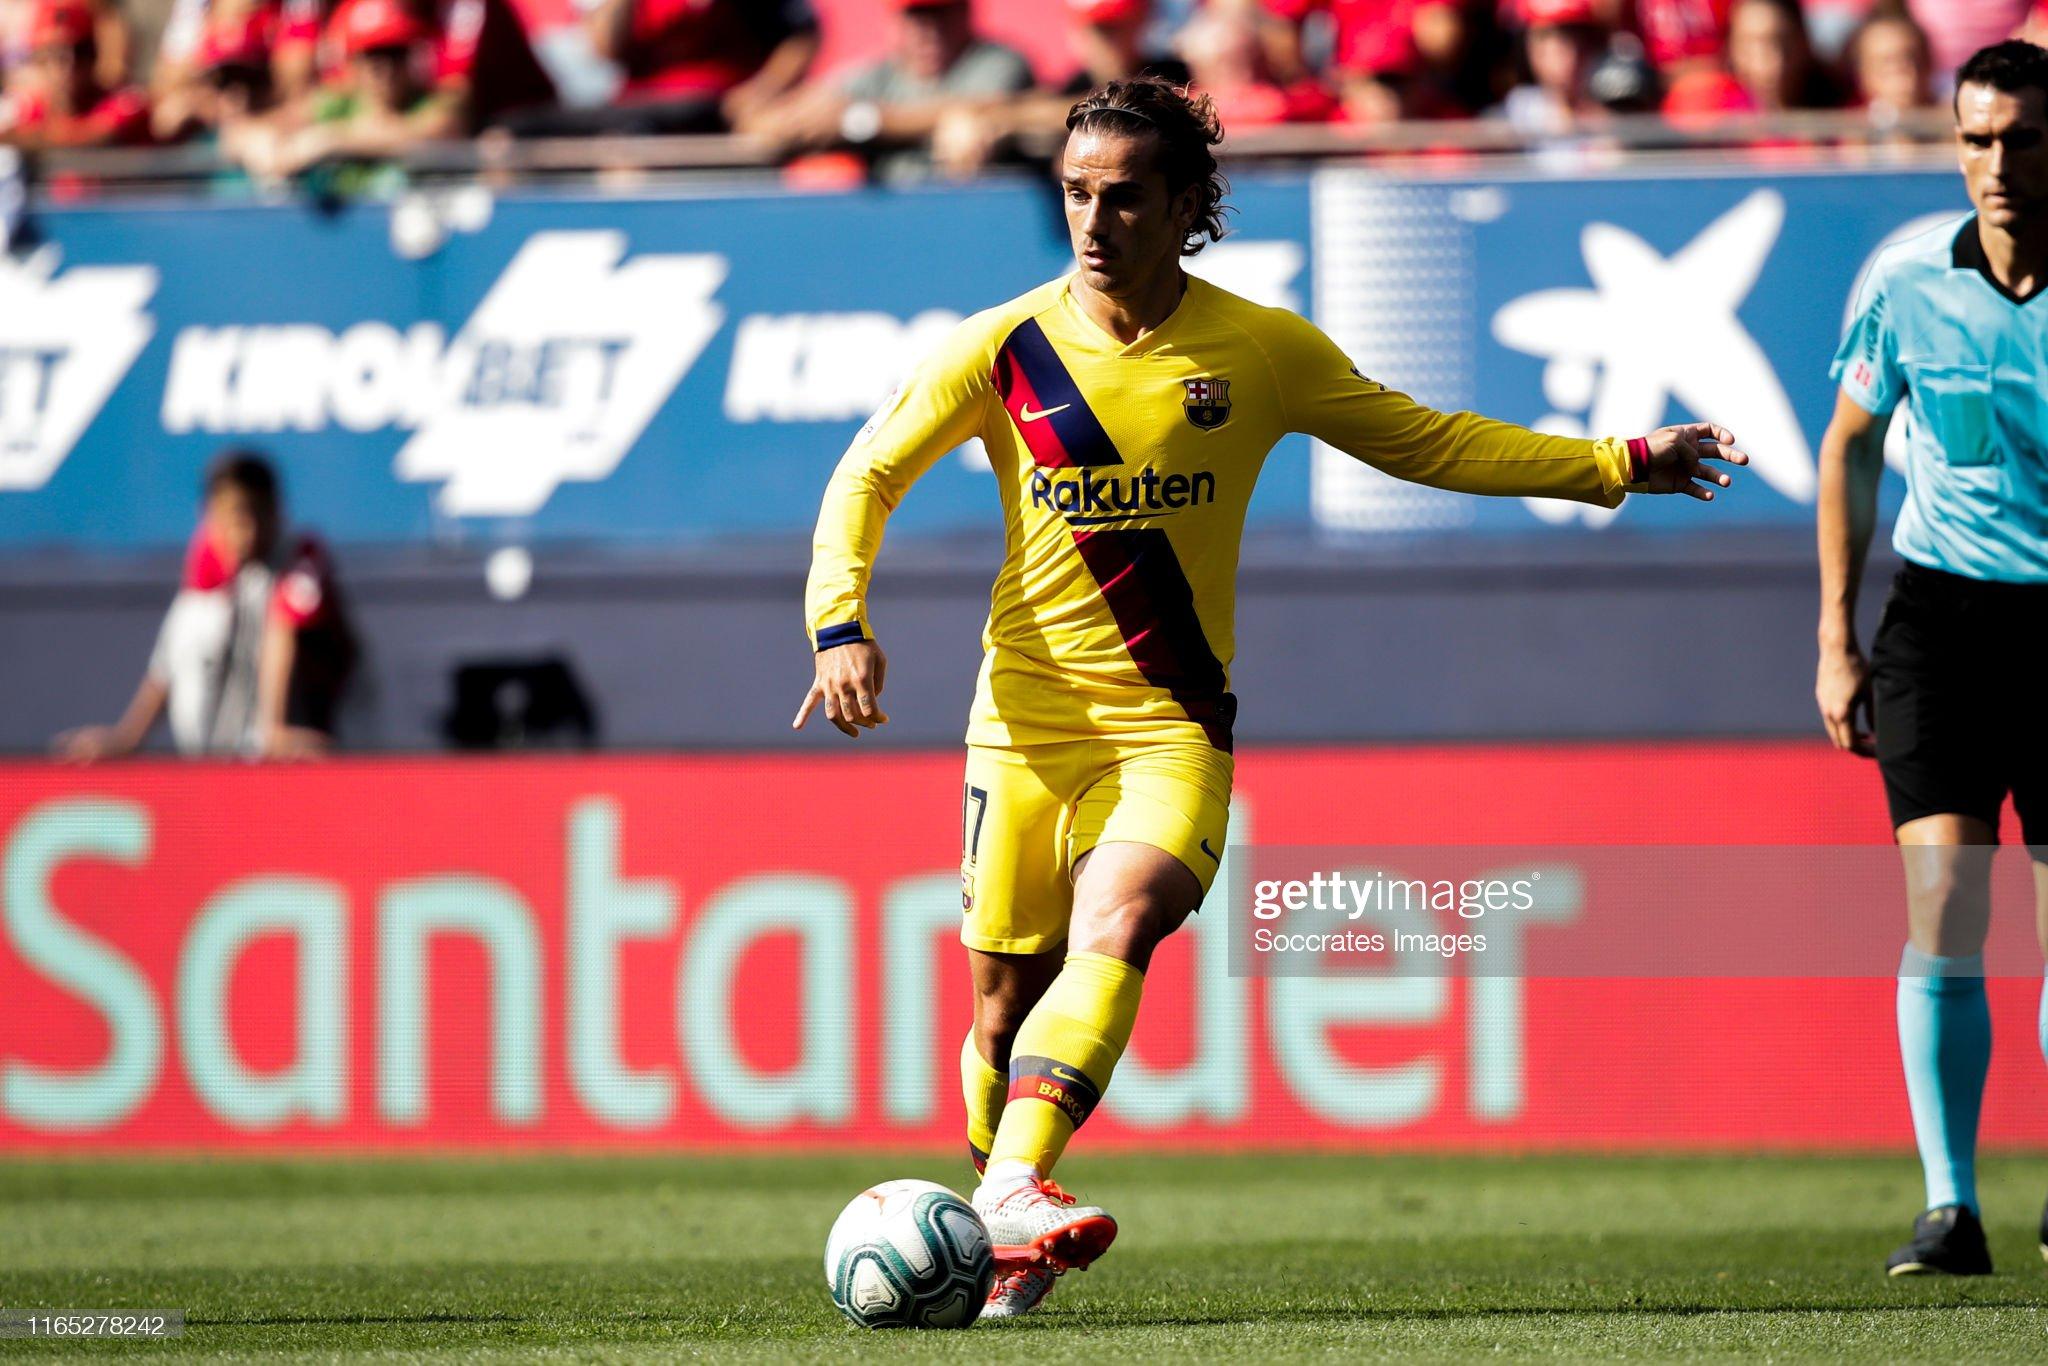 صور مباراة : أوساسونا - برشلونة 2-2 ( 31-08-2019 )  Antoine-griezmann-of-fc-barcelona-during-the-la-liga-santander-match-picture-id1165278242?s=2048x2048